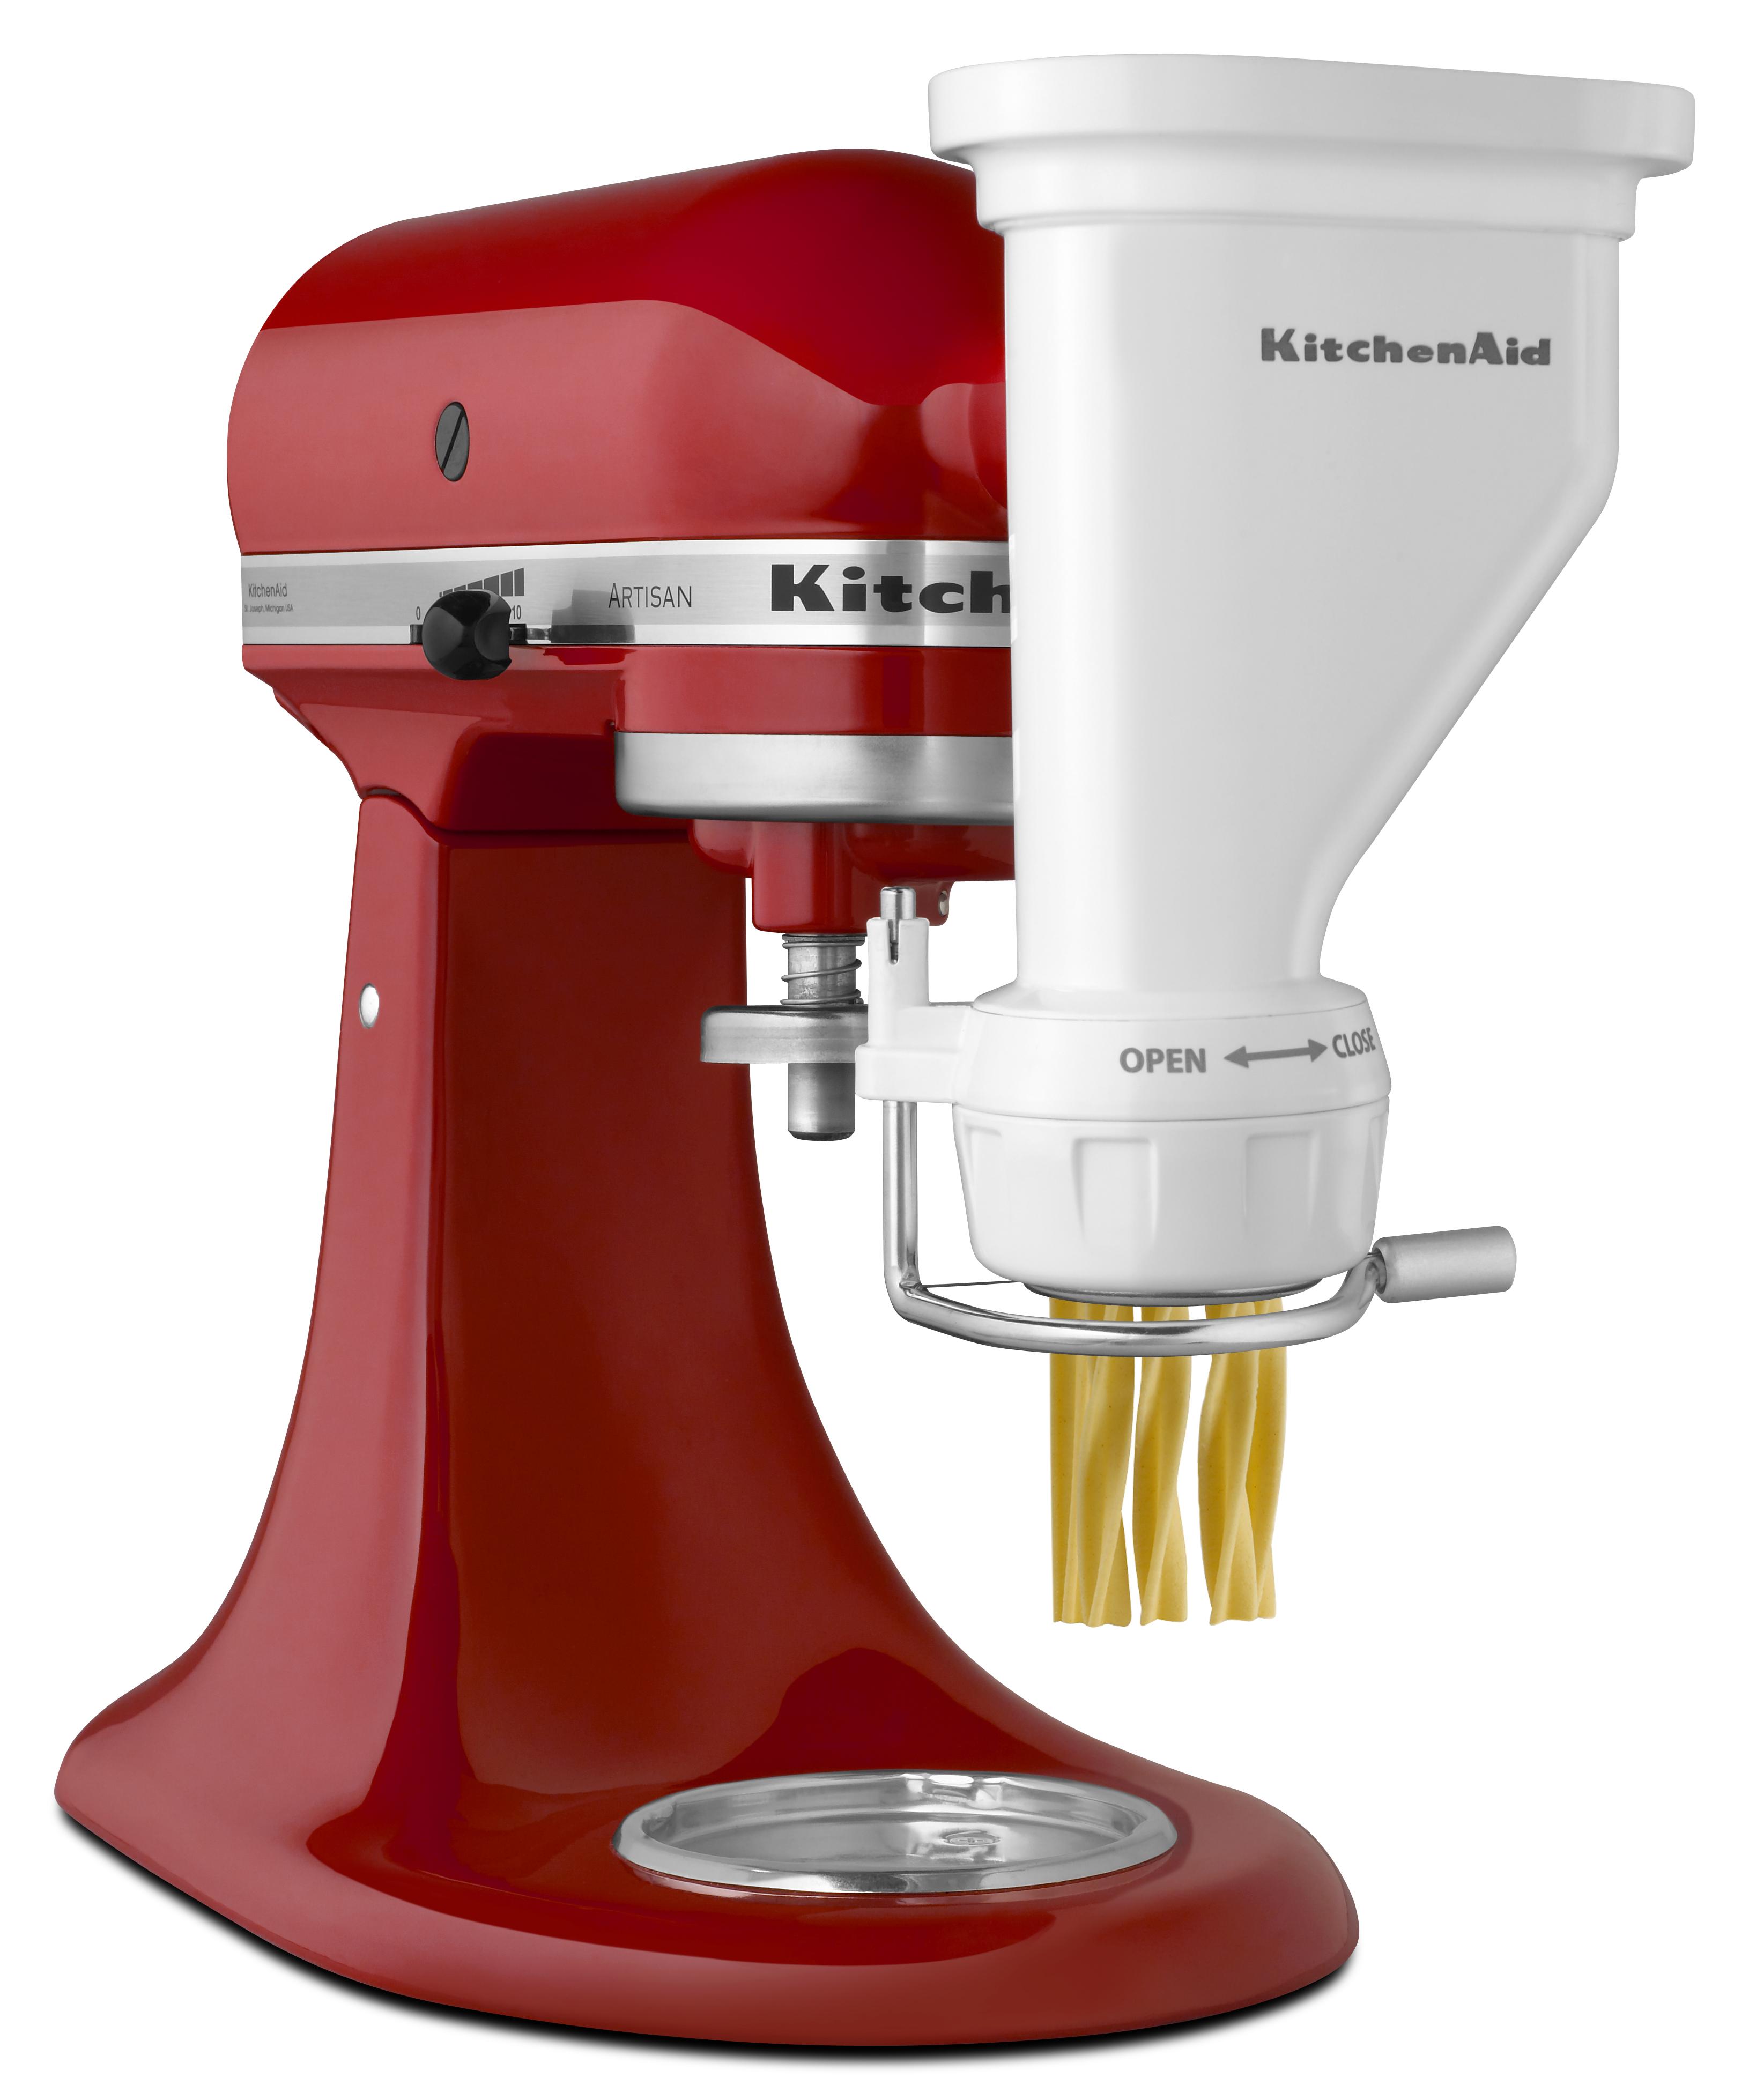 Kitchenaid mixer pasta maker Photo - 1   Kitchen ideas